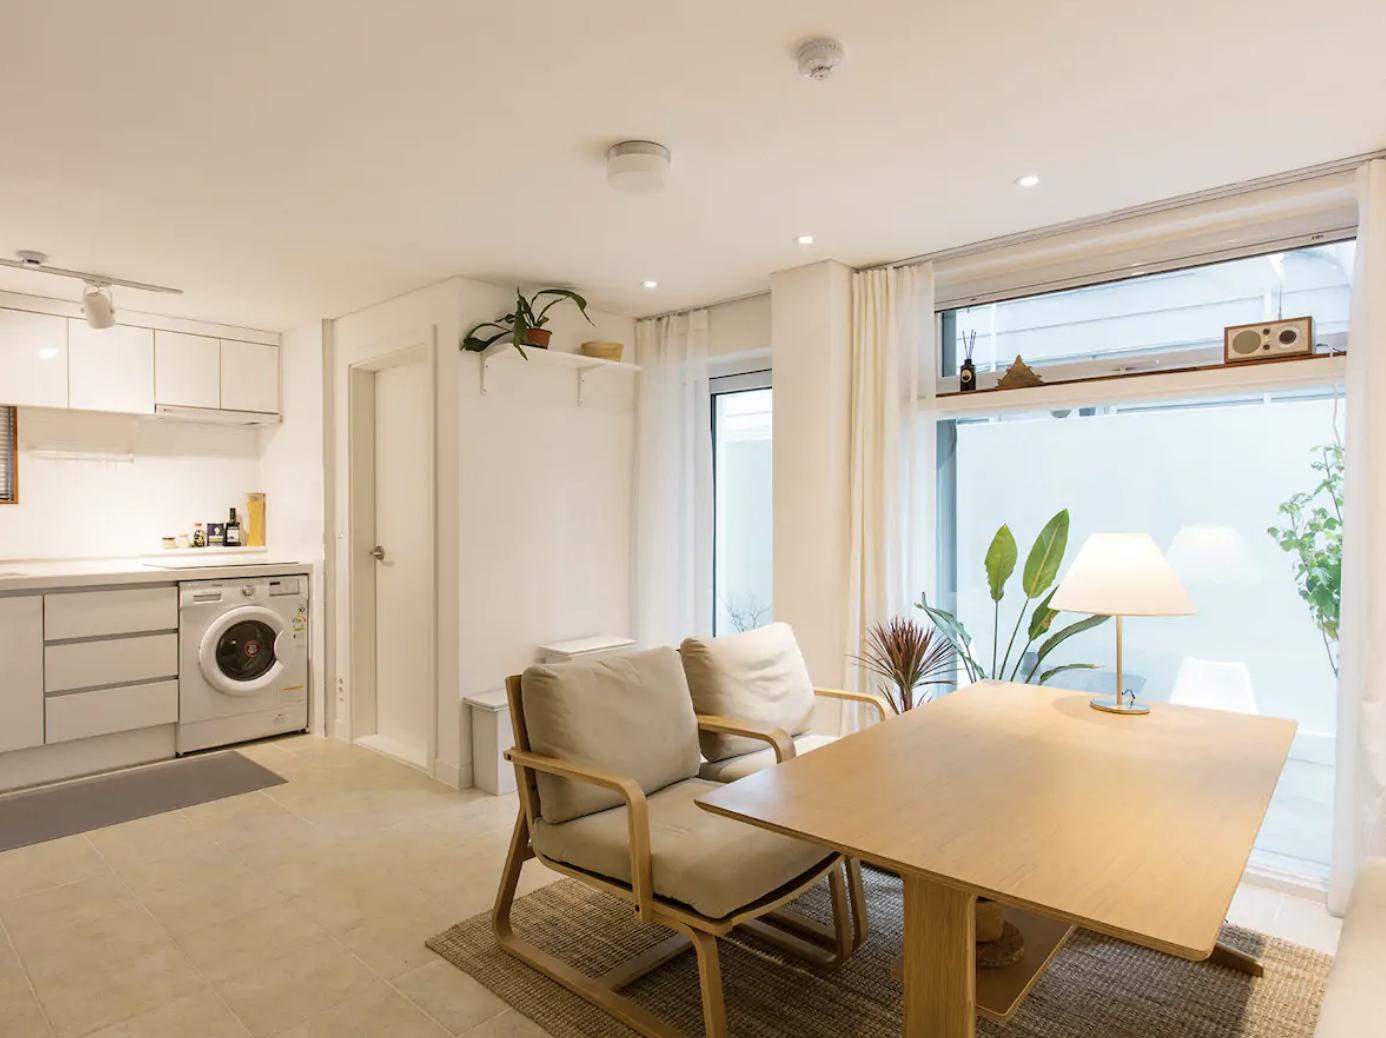 Apartment Configuration (Copy)